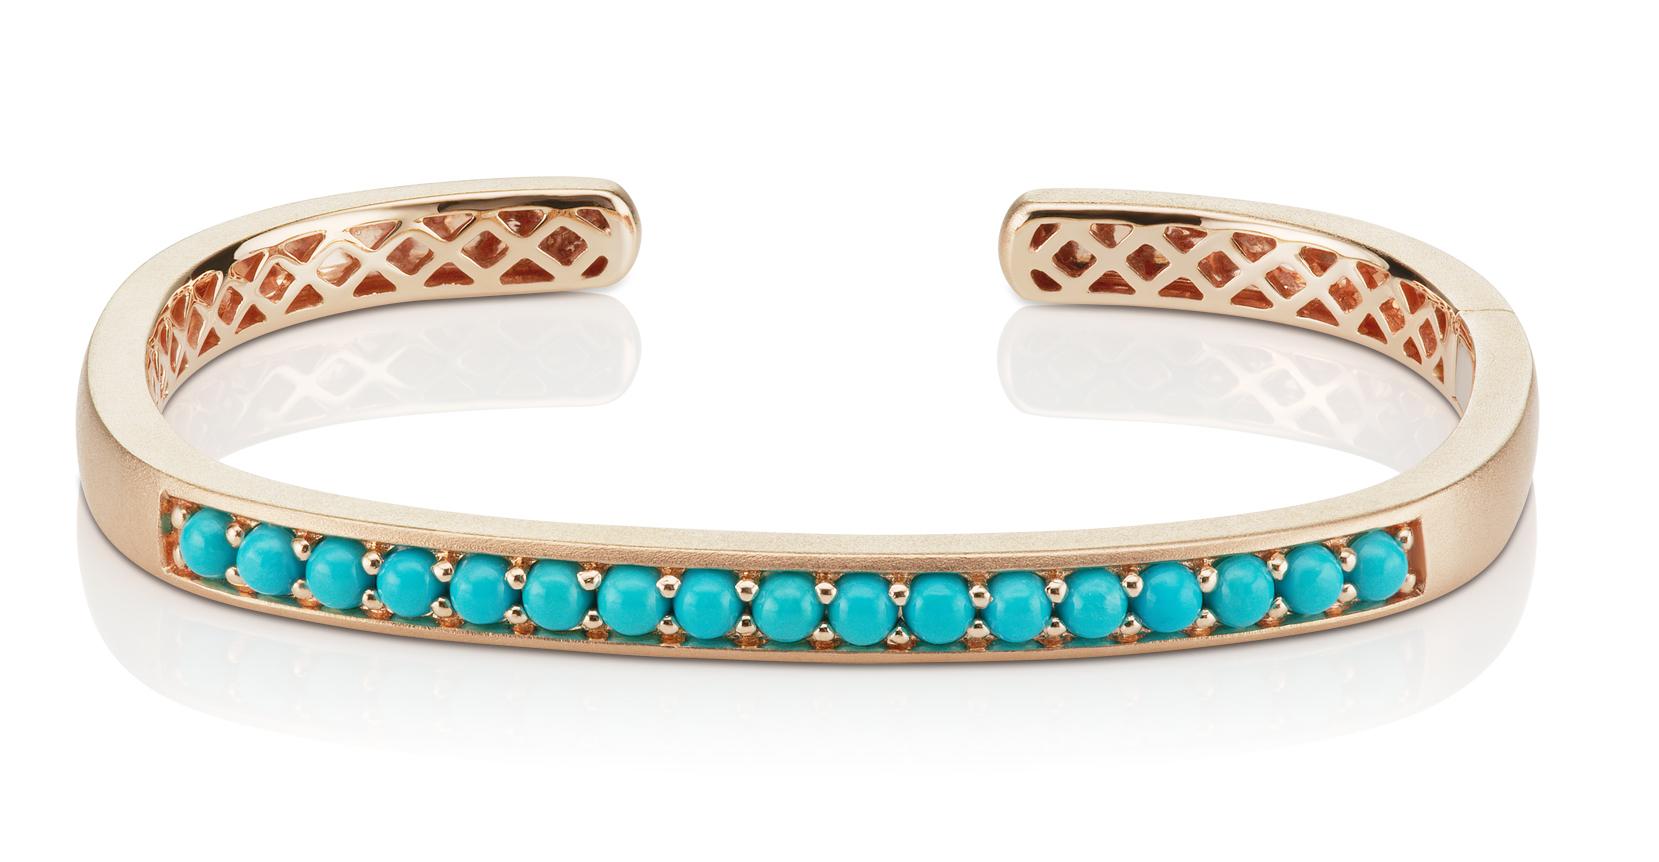 Cirque cuff bracelet